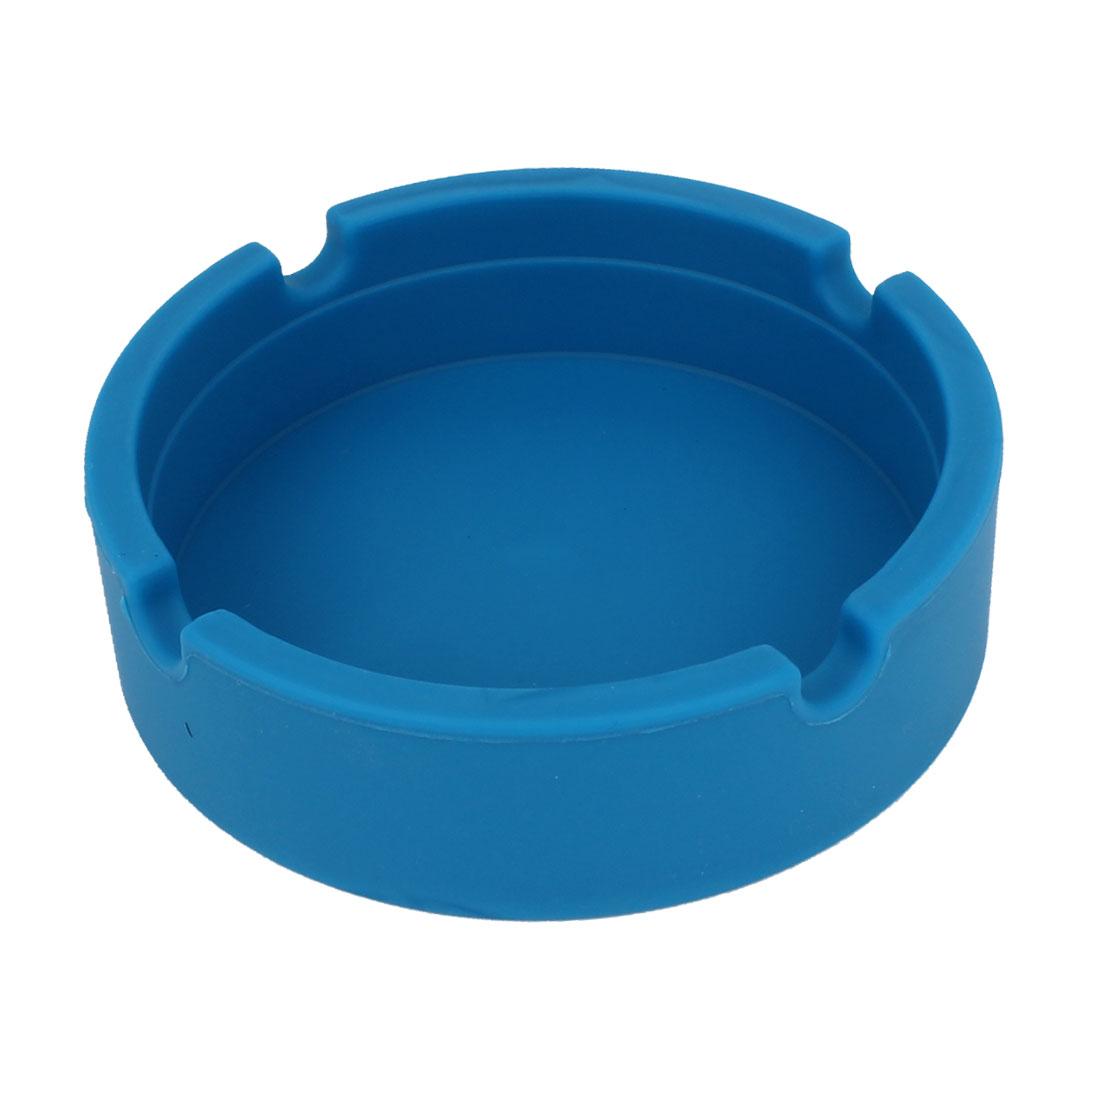 Blue Silicone Round Shape Wine Beverage Bottle Cup Coaster Holder